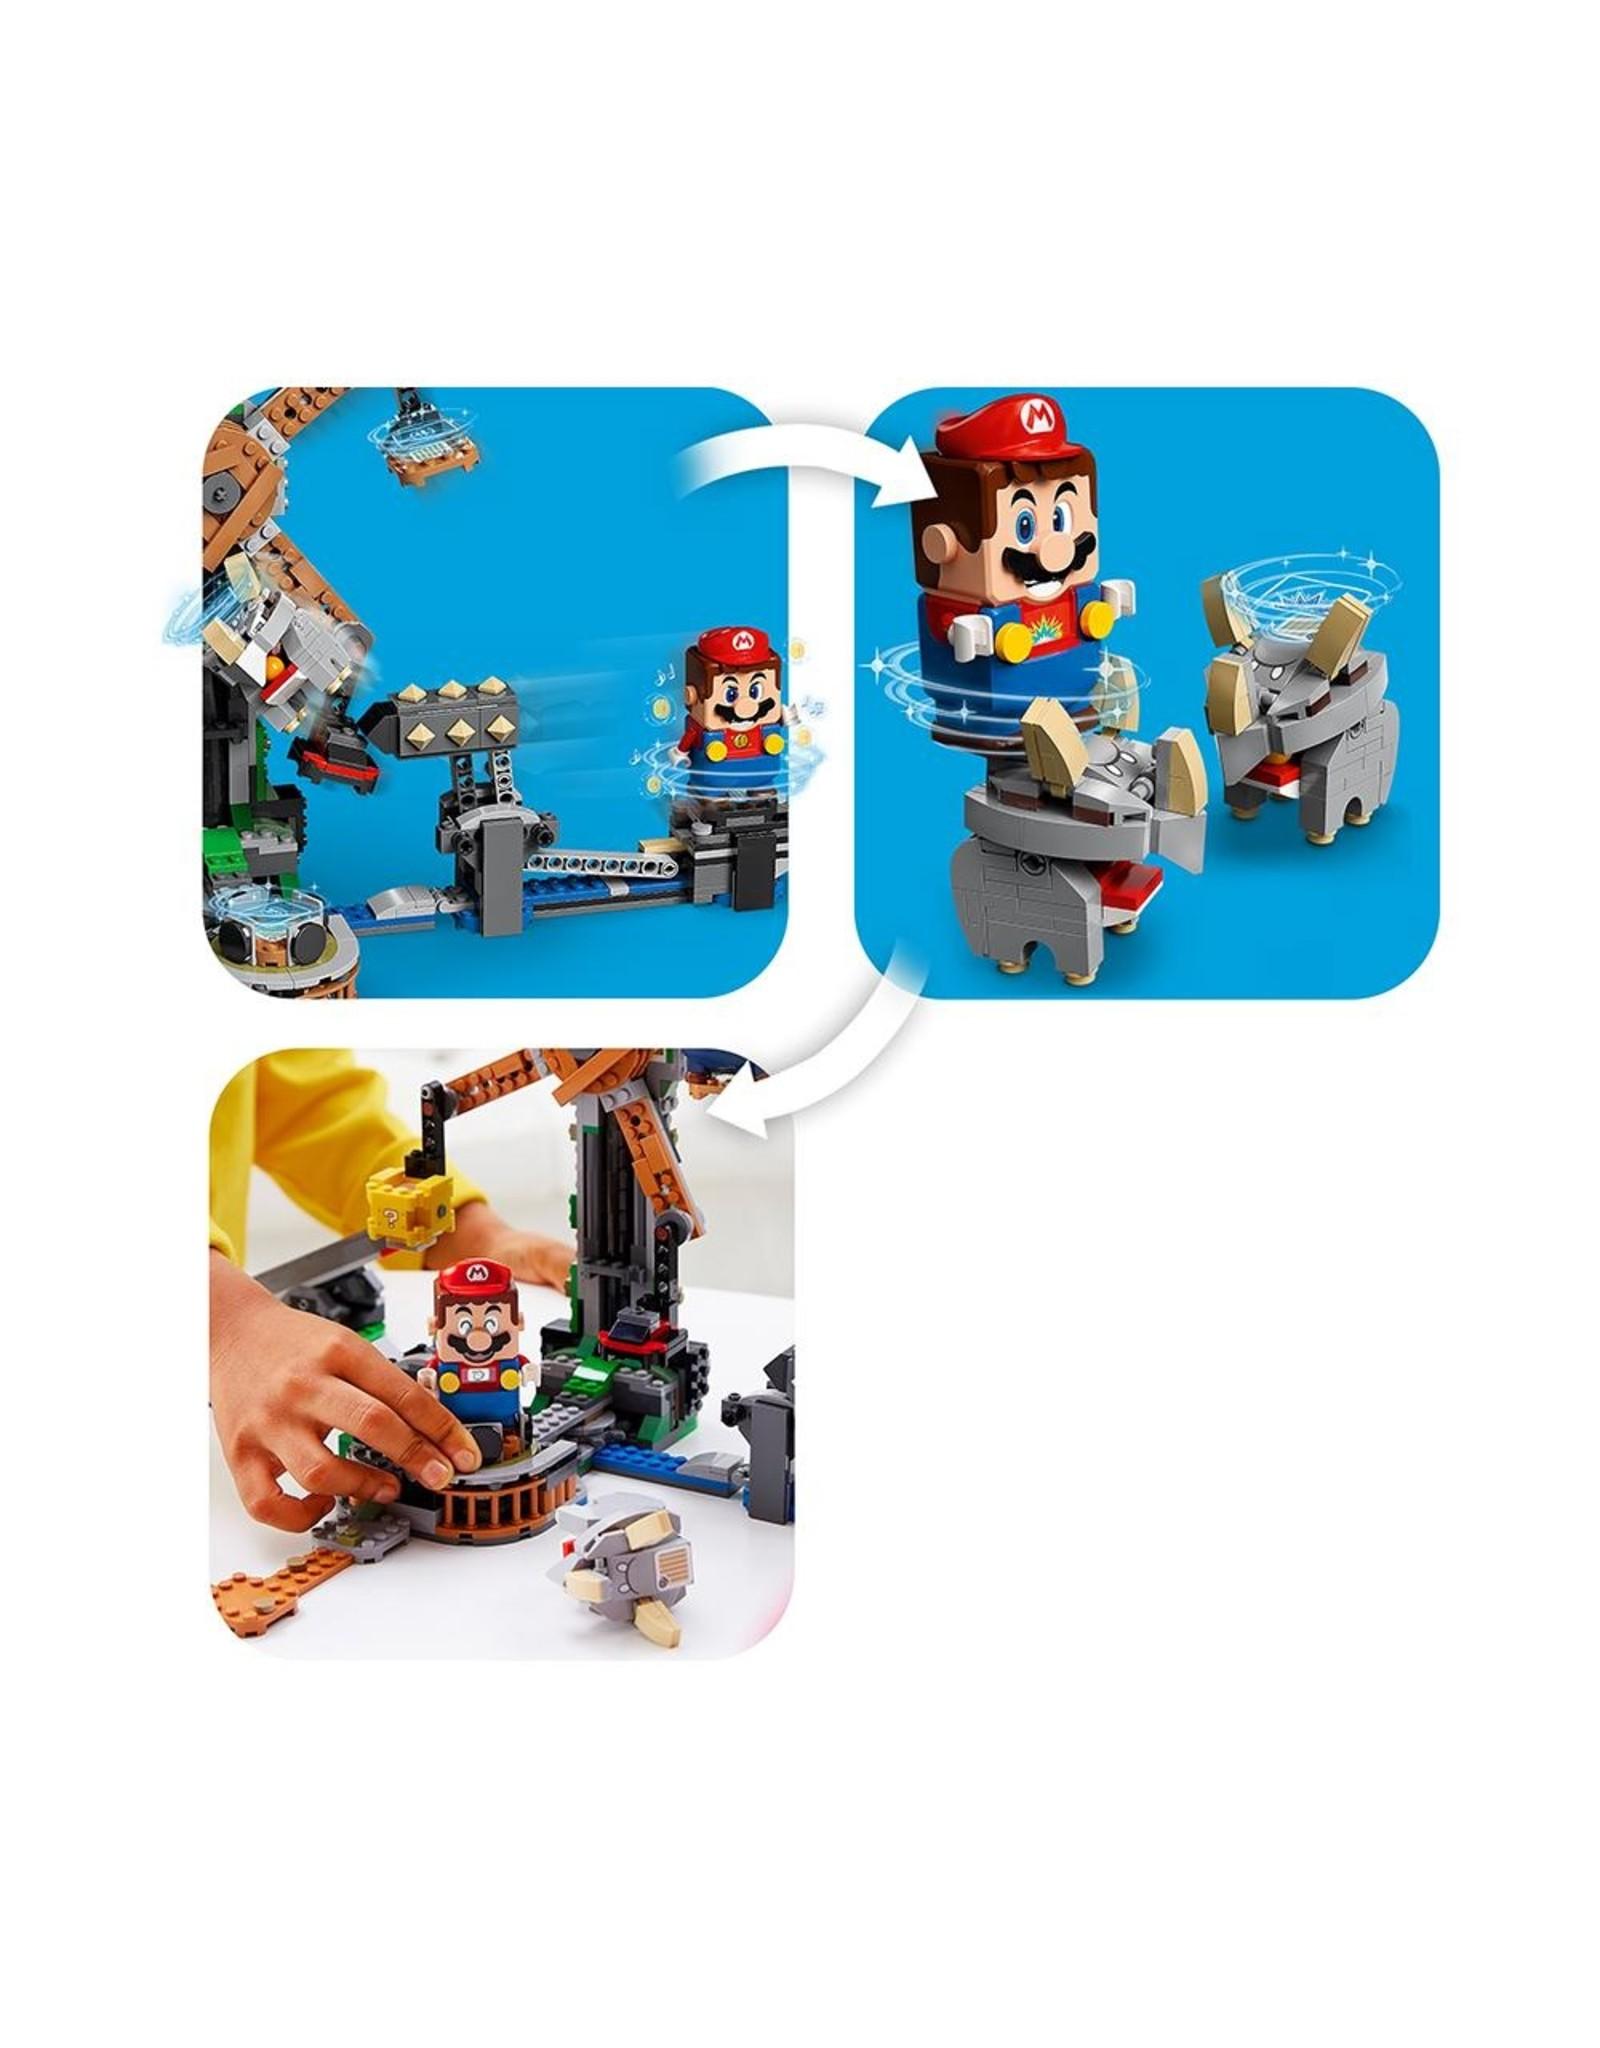 LEGO Super Mario - 71390 Reznor Knockdown Expansion Set